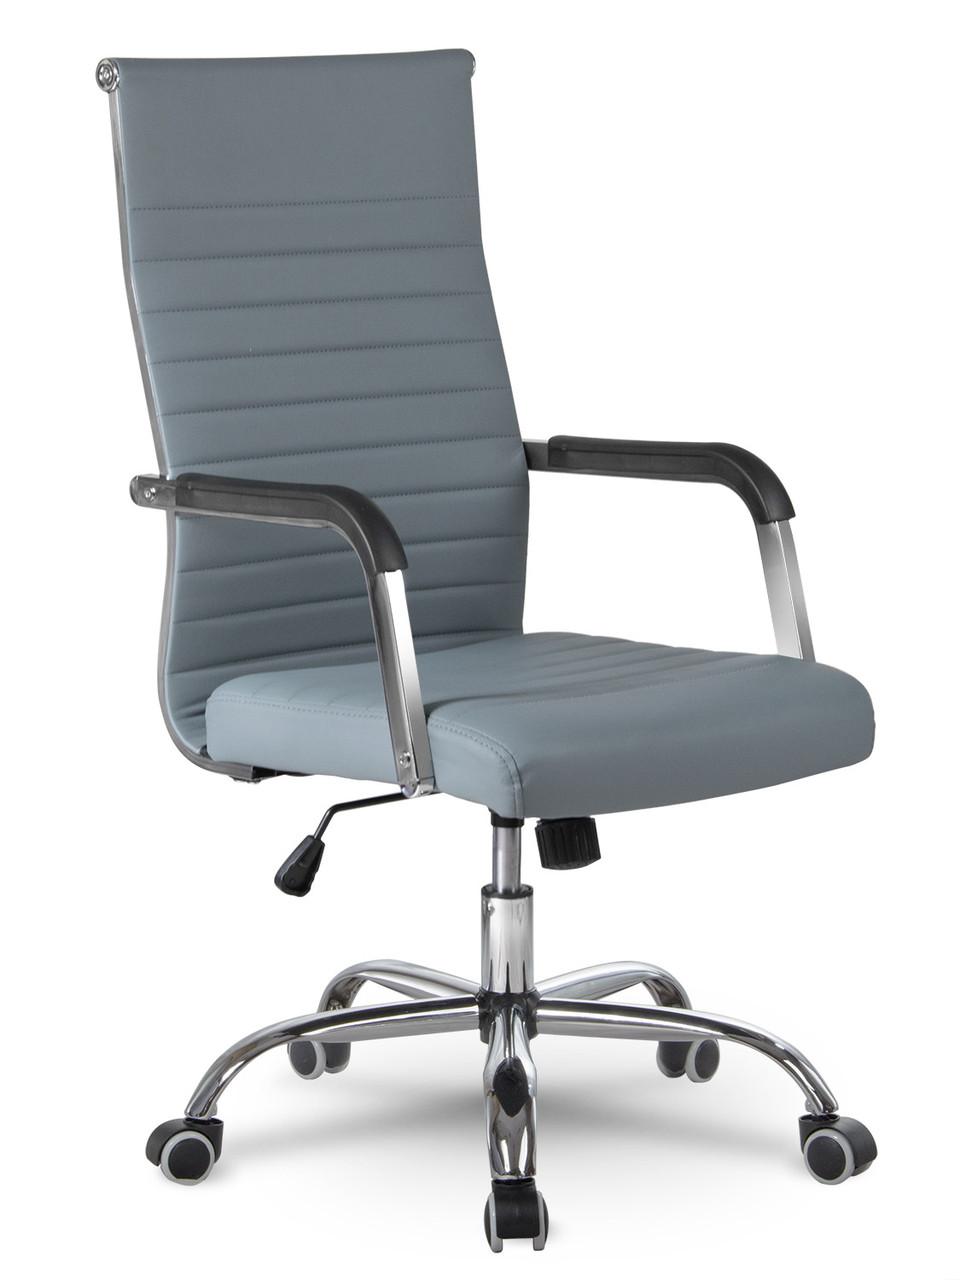 Кресло офисное Sofotel Boston серый (9109)